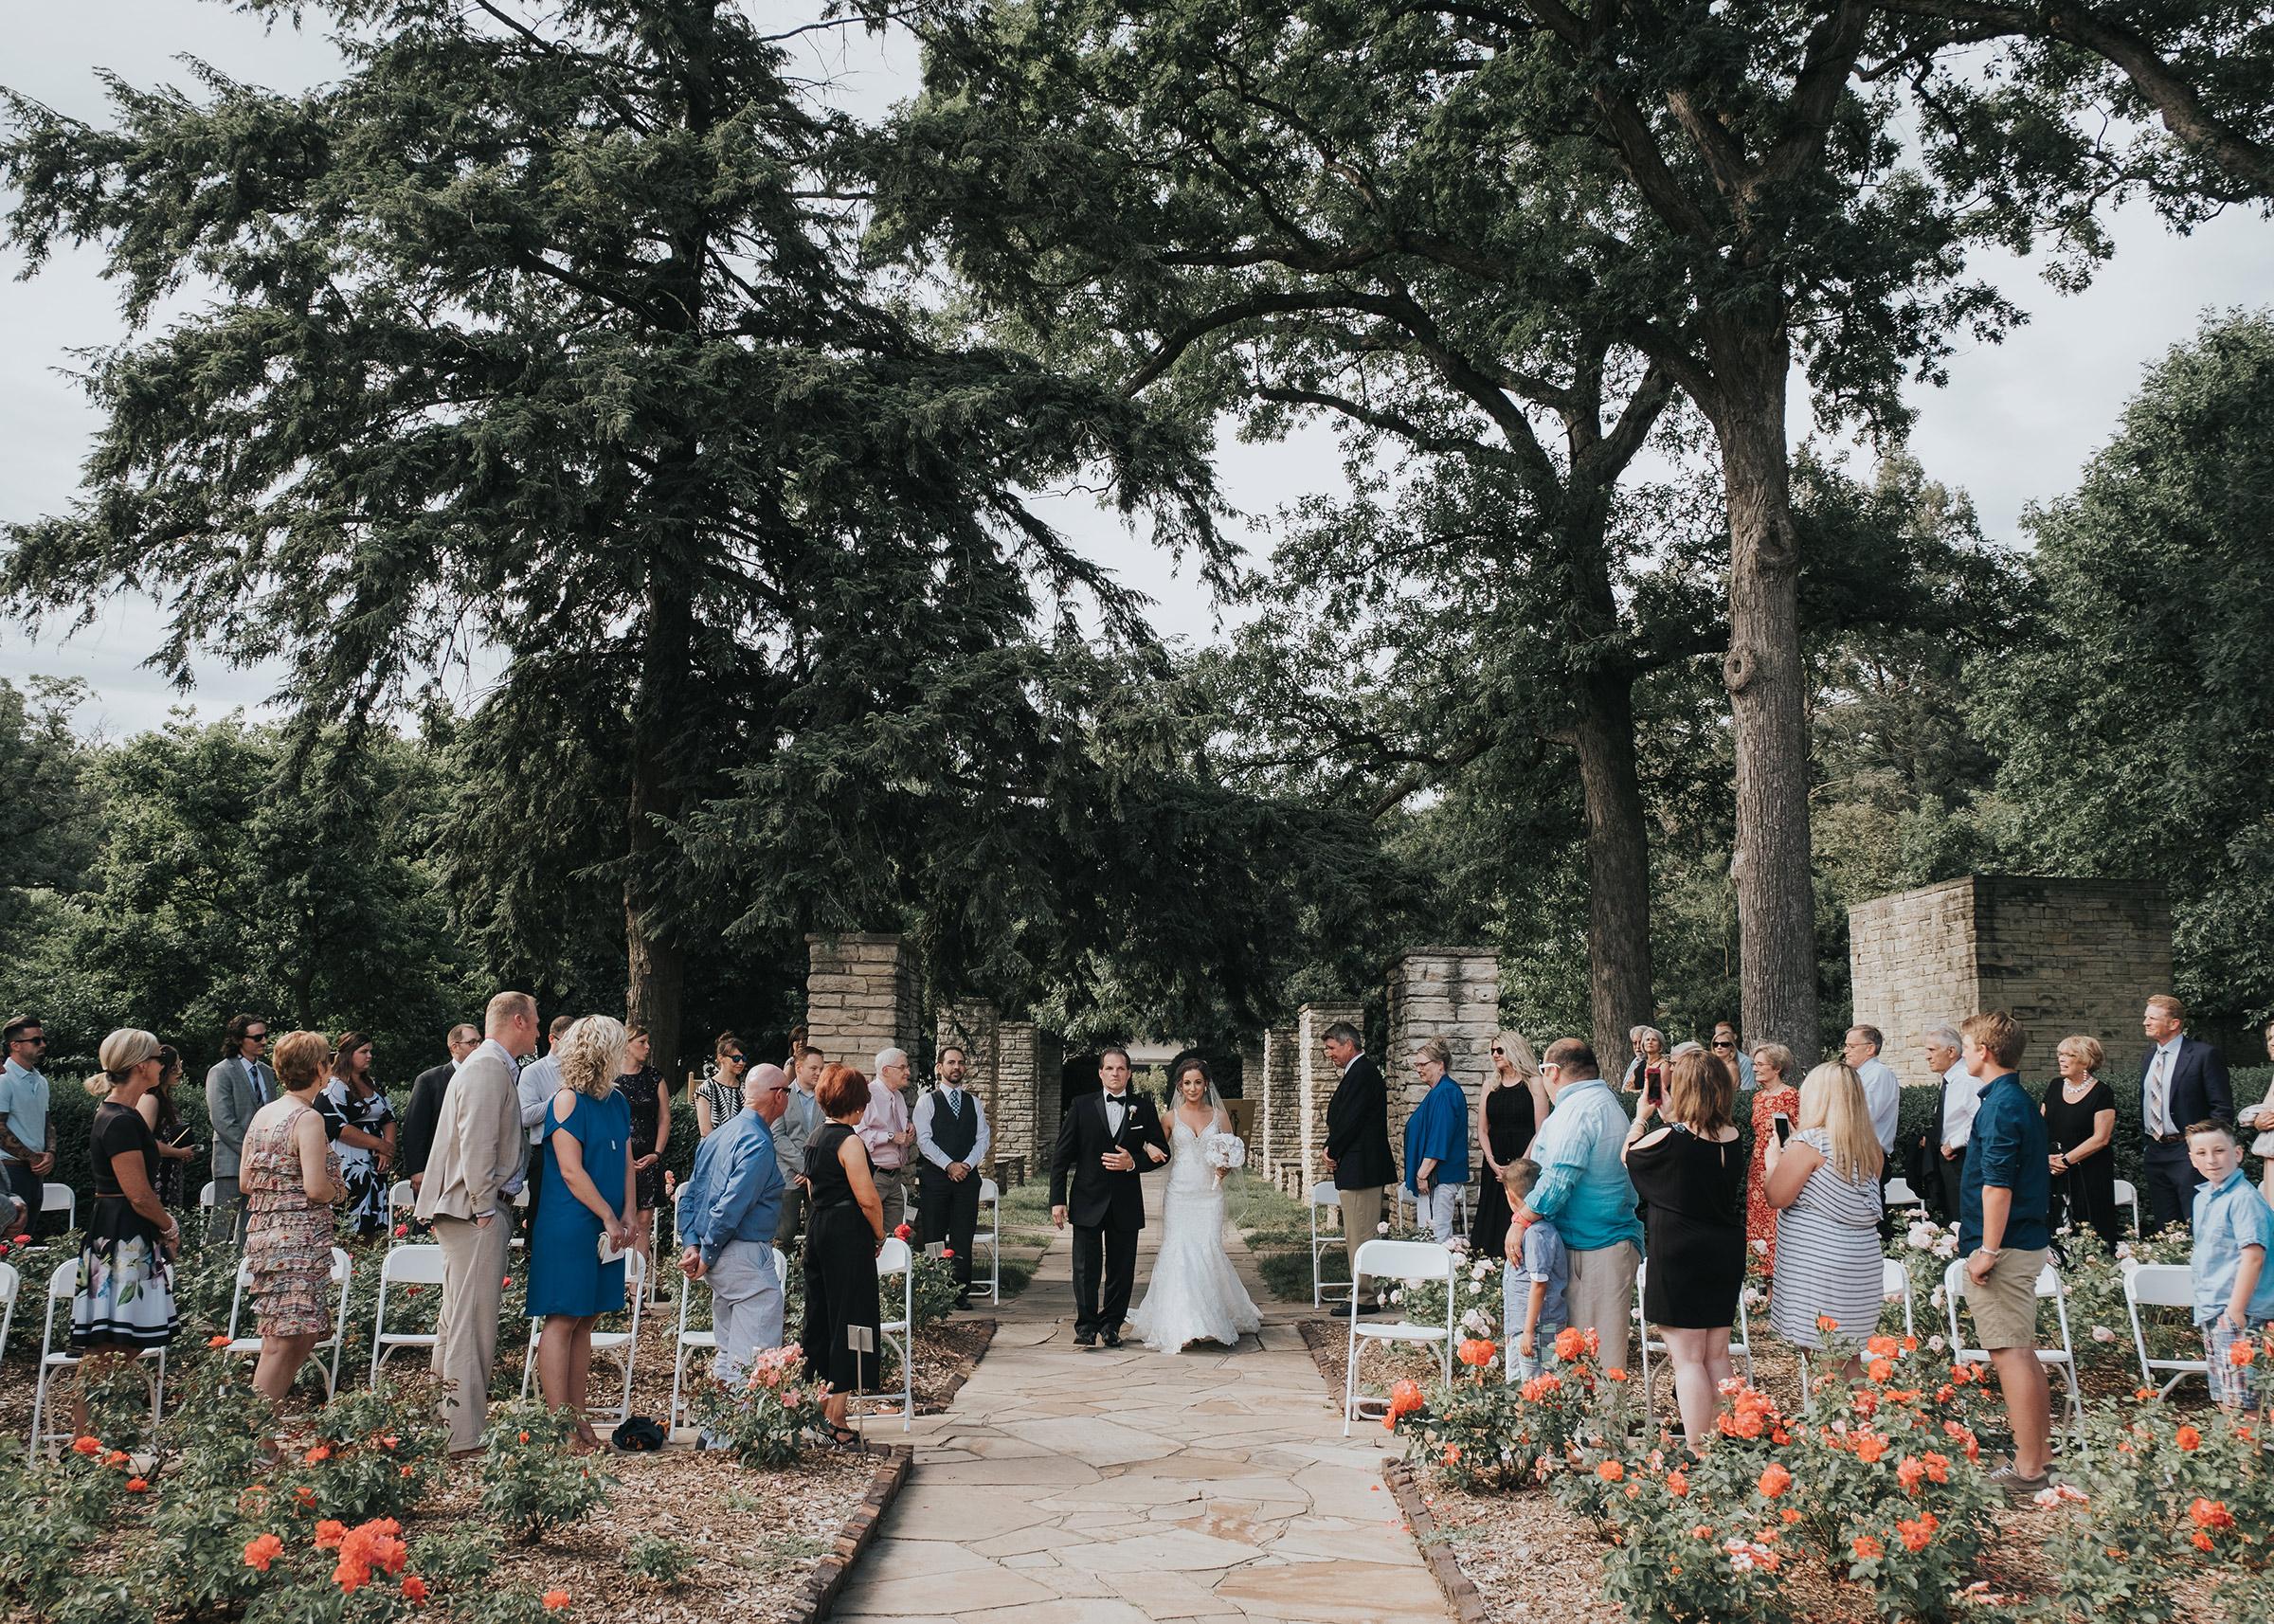 bride-walking-down-aisle-with-her-dad-desmoines-iowa-rose-garden-raelyn-ramey-photography.jpg